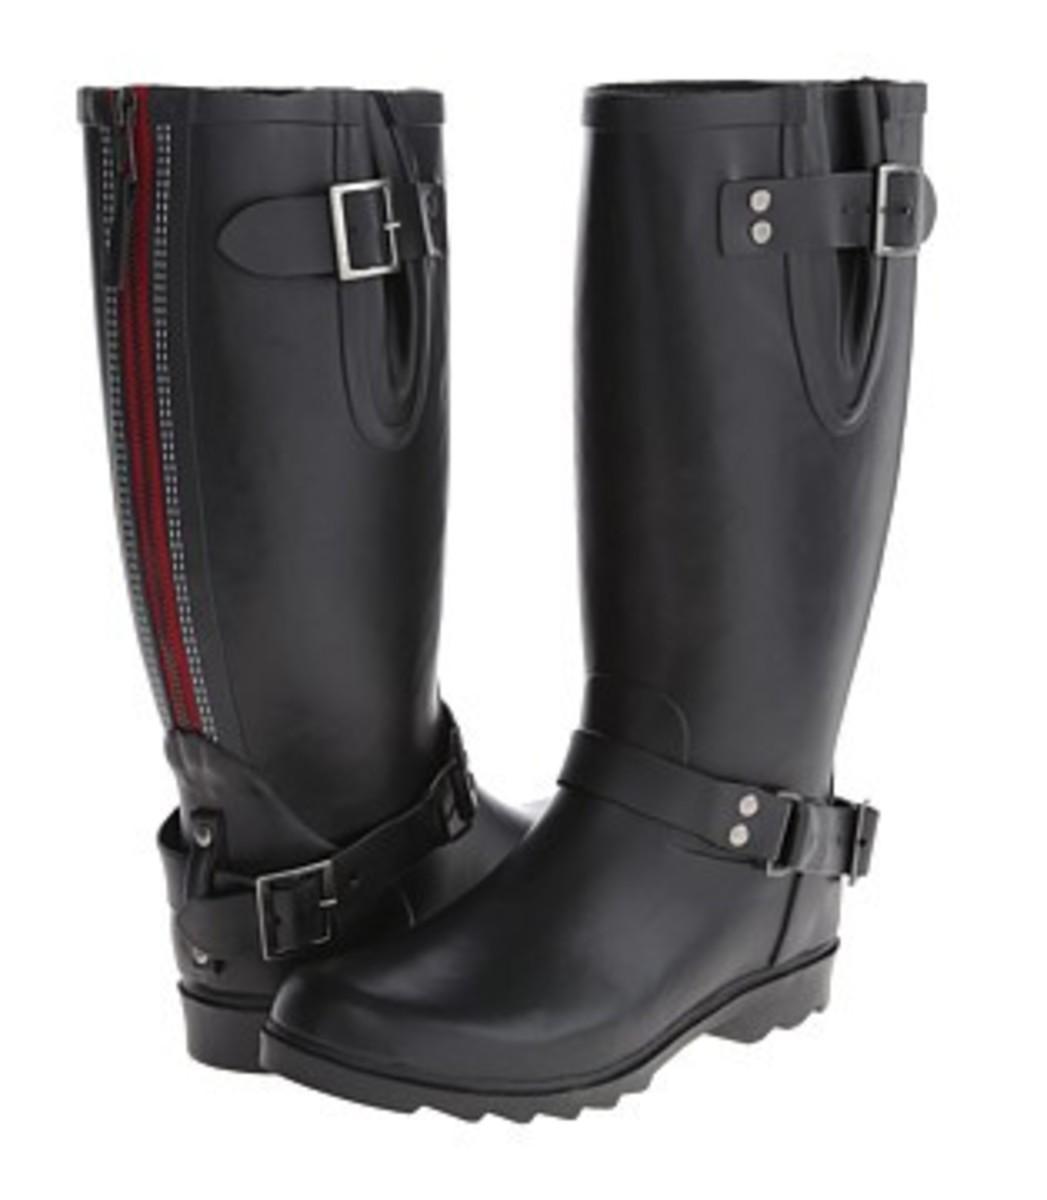 Gabriella Rocha Mariene Wide Calf Rain Boots